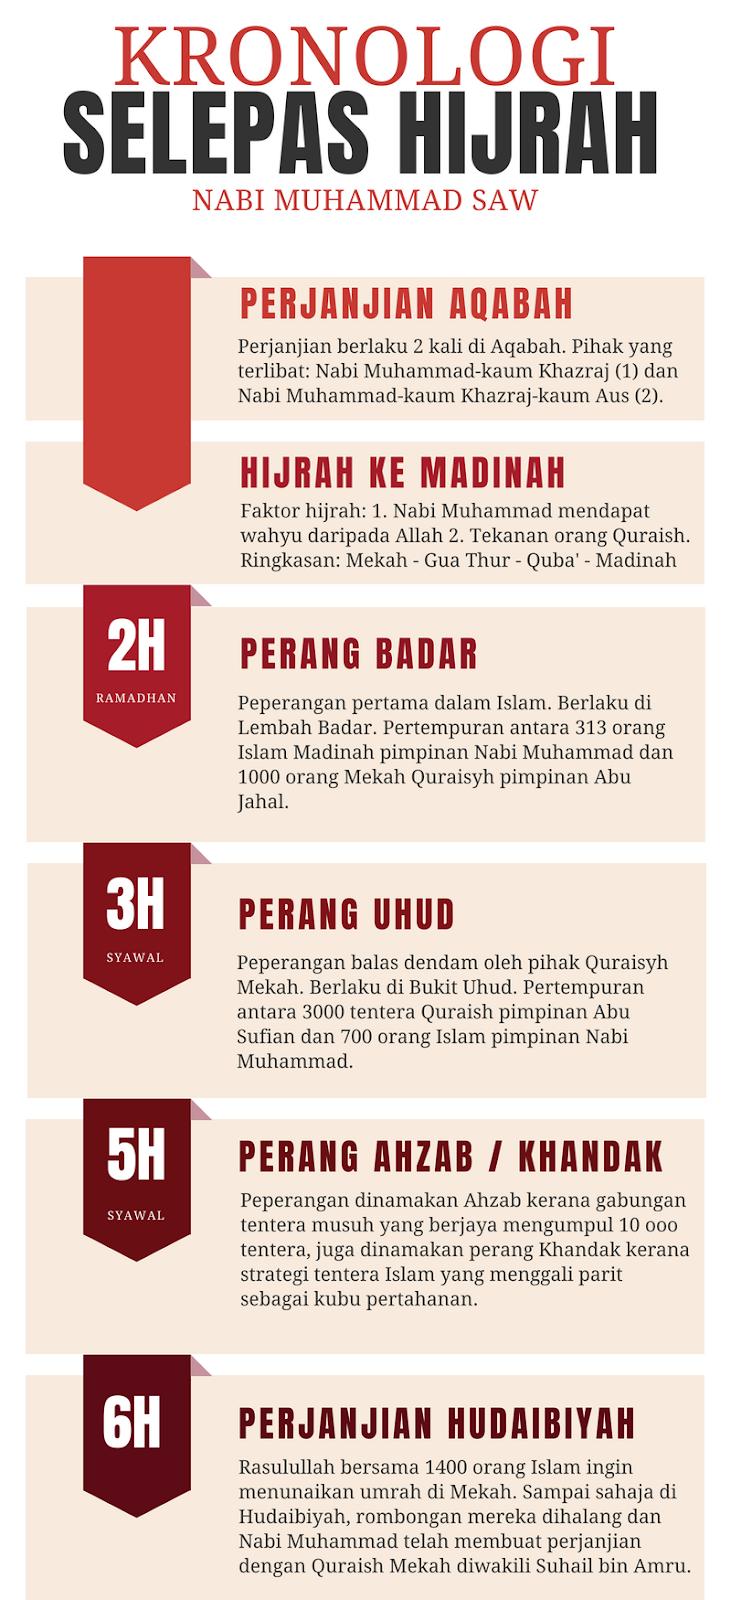 Perjanjian Hudaibiyah Kronologi Selepas Hijrah Nabi Muhammad Dar At Taqwa Travel Tours